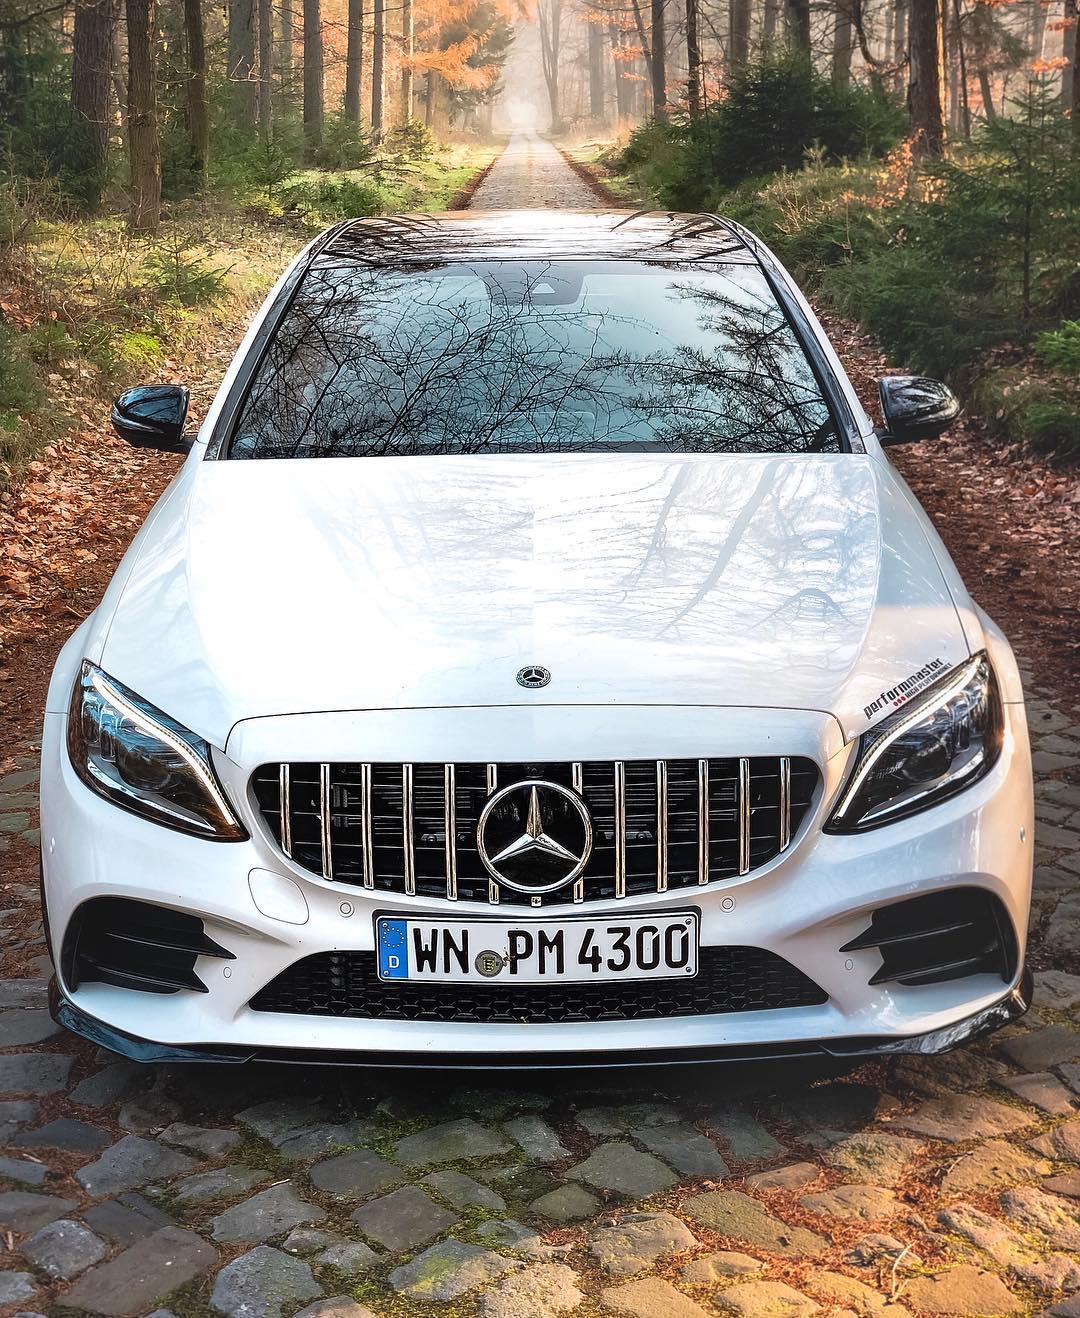 "What a car….what a mystic location…C43 ""s"" by @performmaster  #performmaster #c43amg #c43 #c43performmaster #amg #mercedesamg #amgc43 #c43facelift #c43mopf #automanntv"